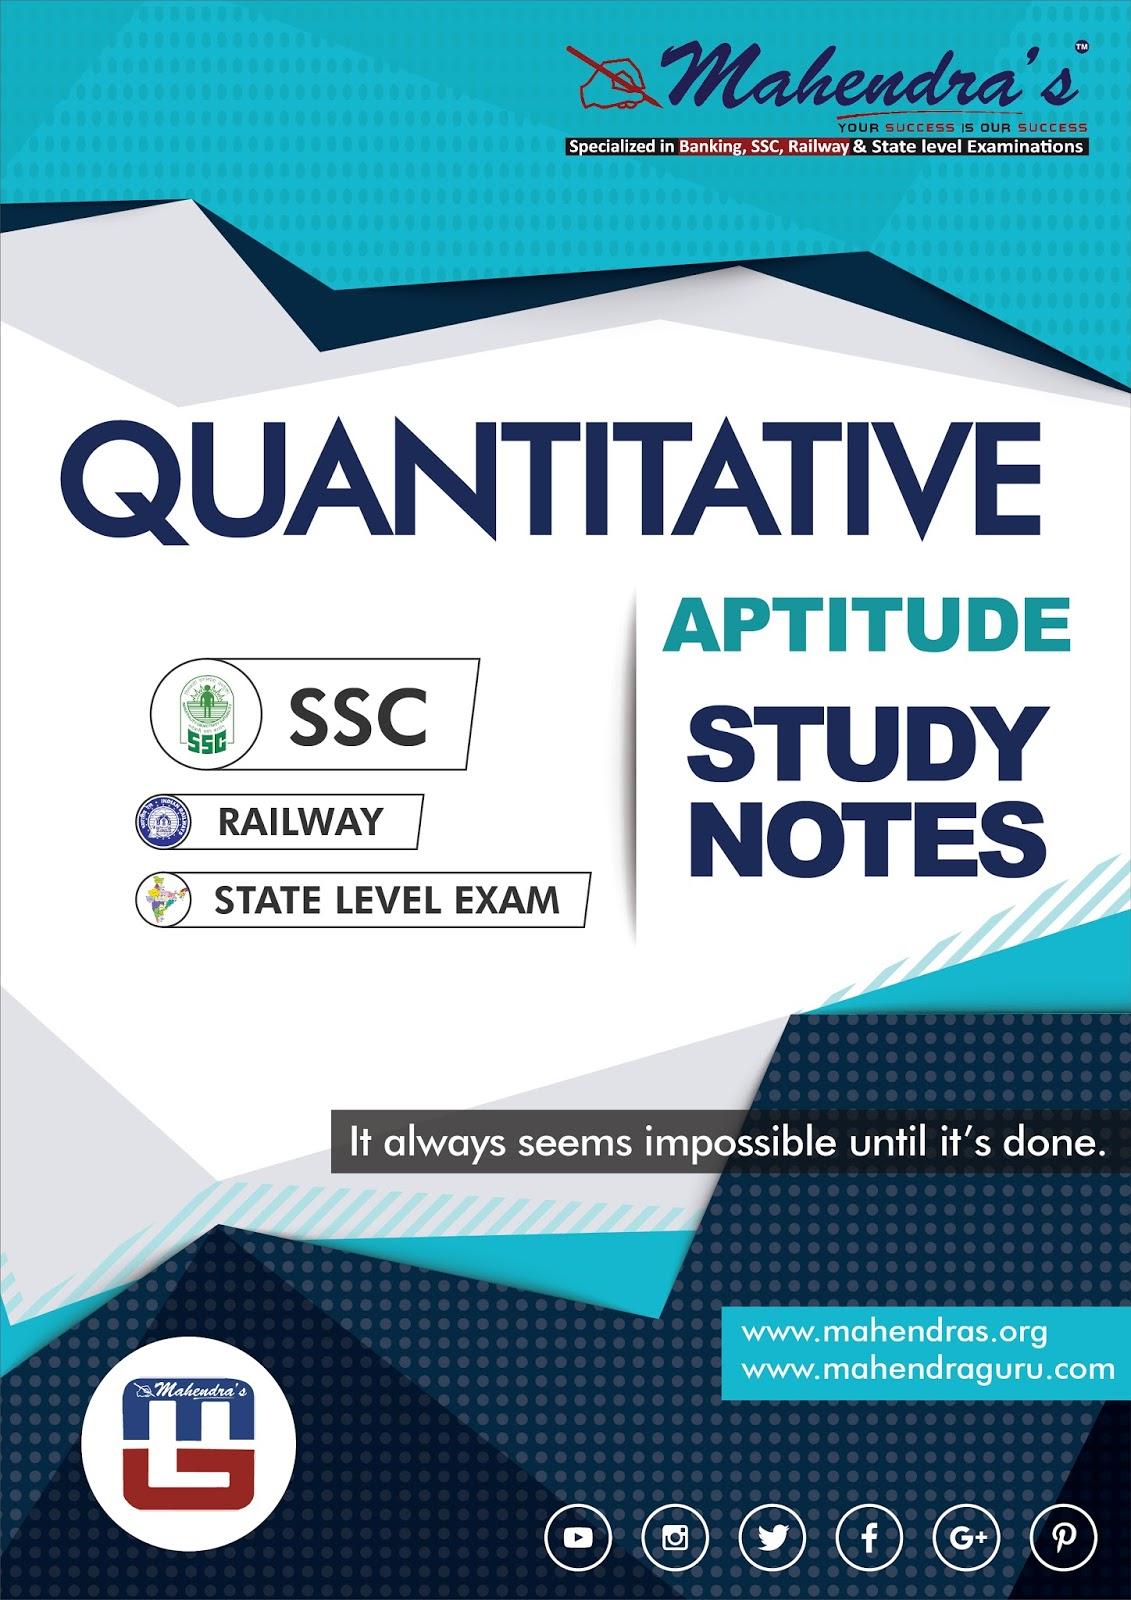 Quantitative Aptitude Notes Pdf